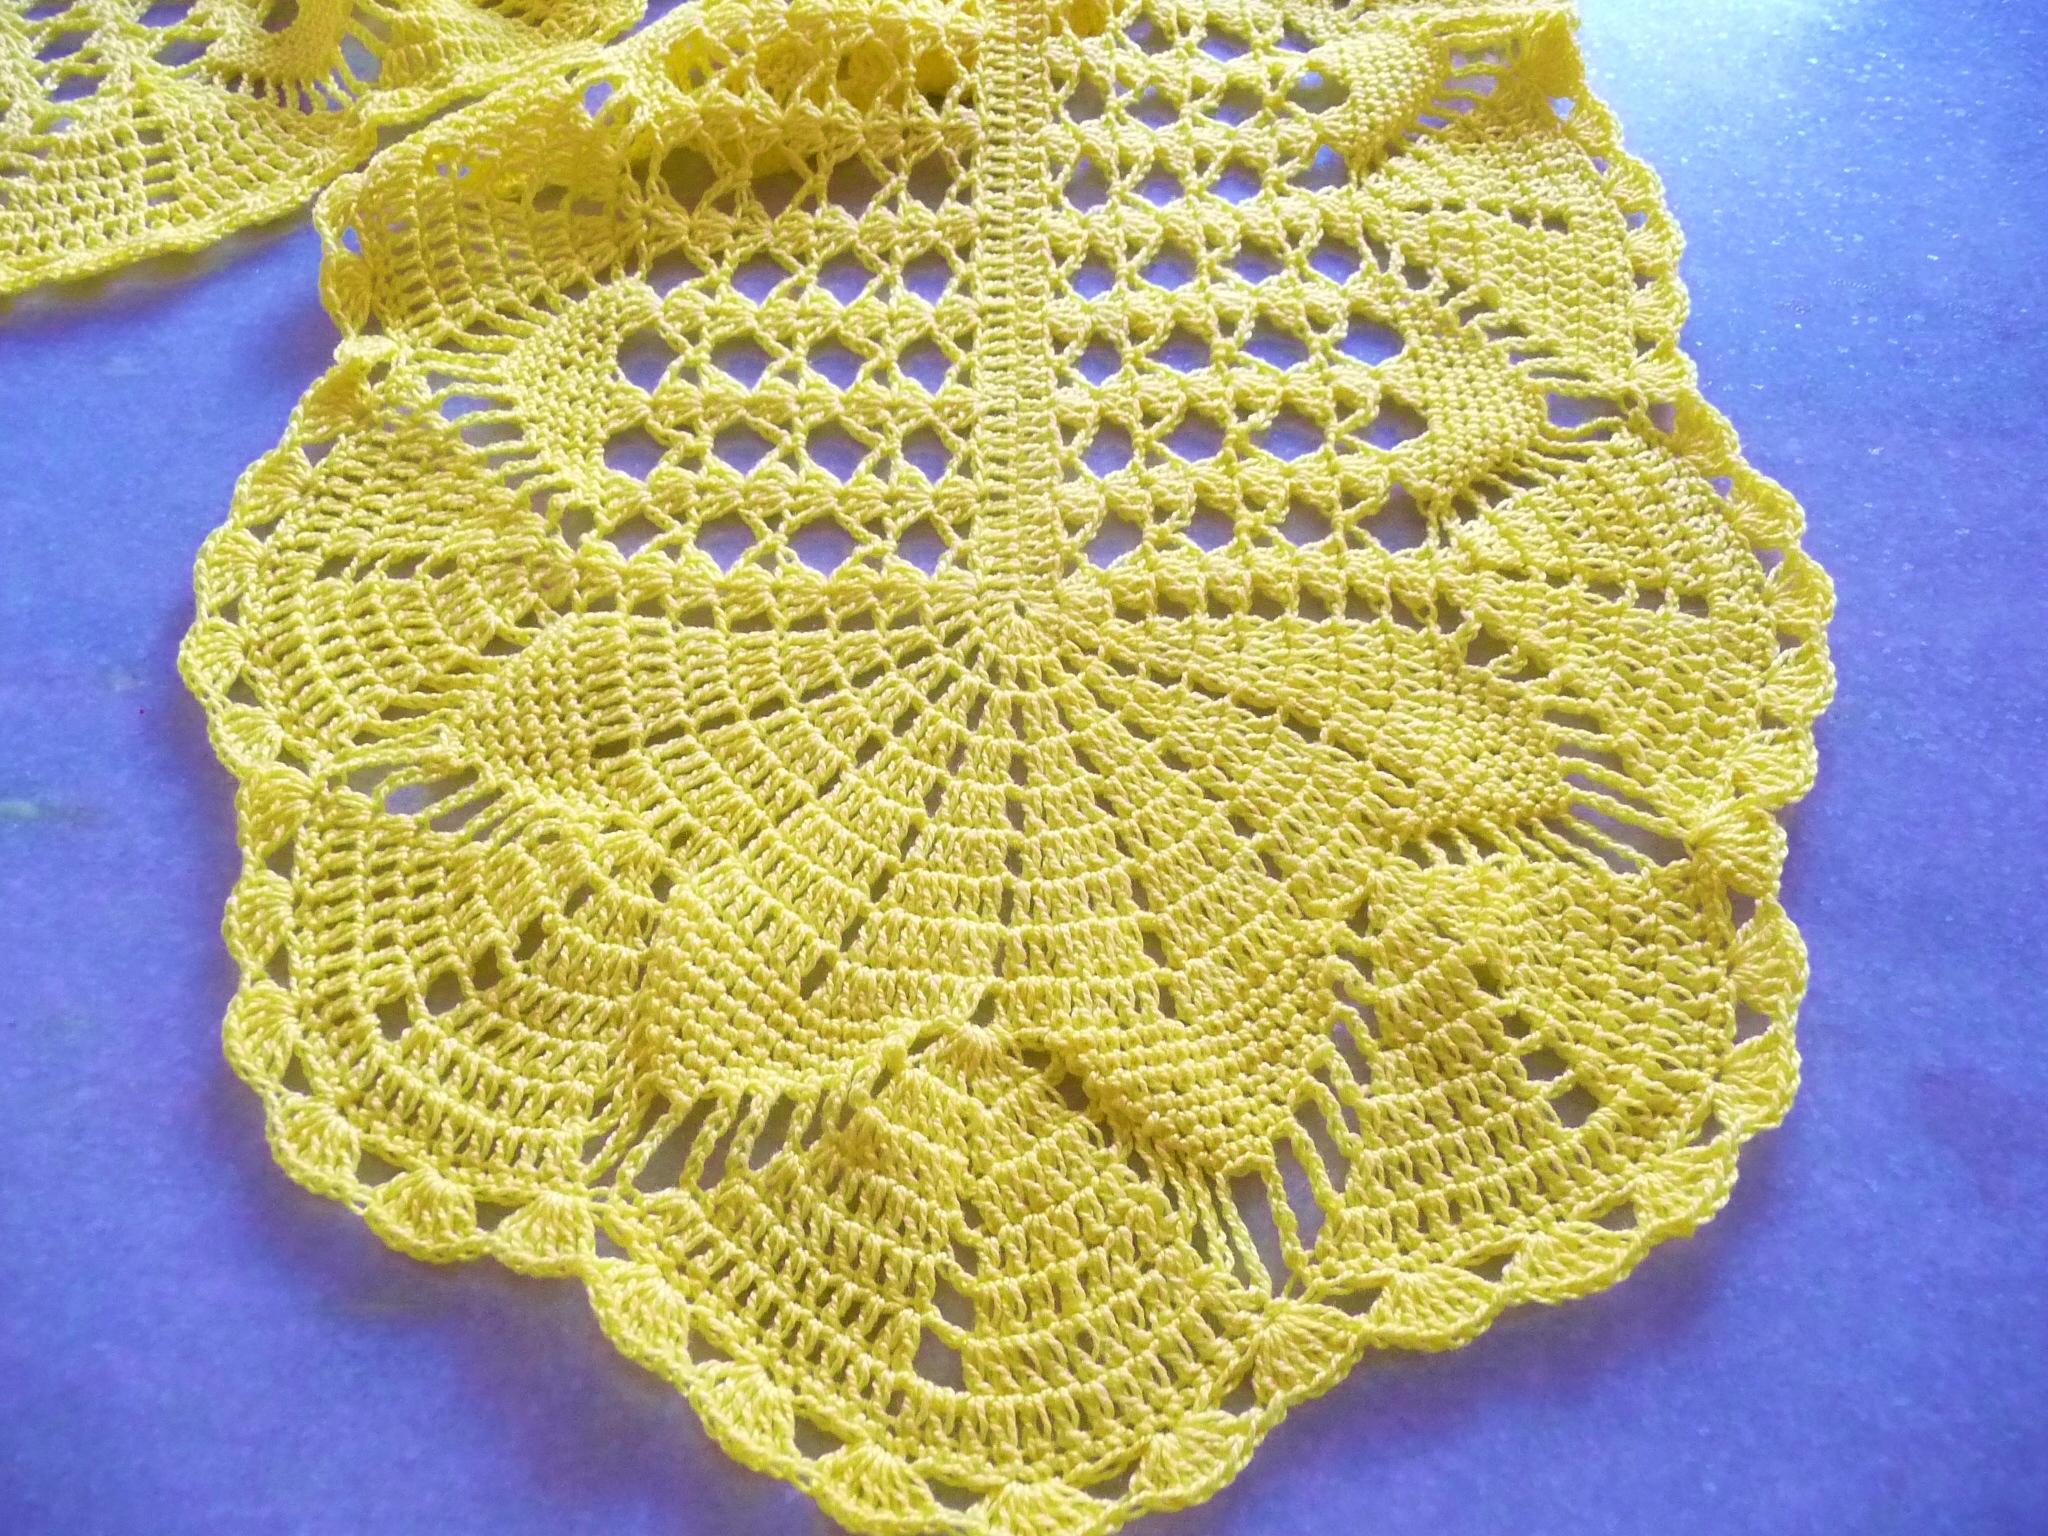 caminho de mesa em croche caminho de mesa em croche caminho de mesa em